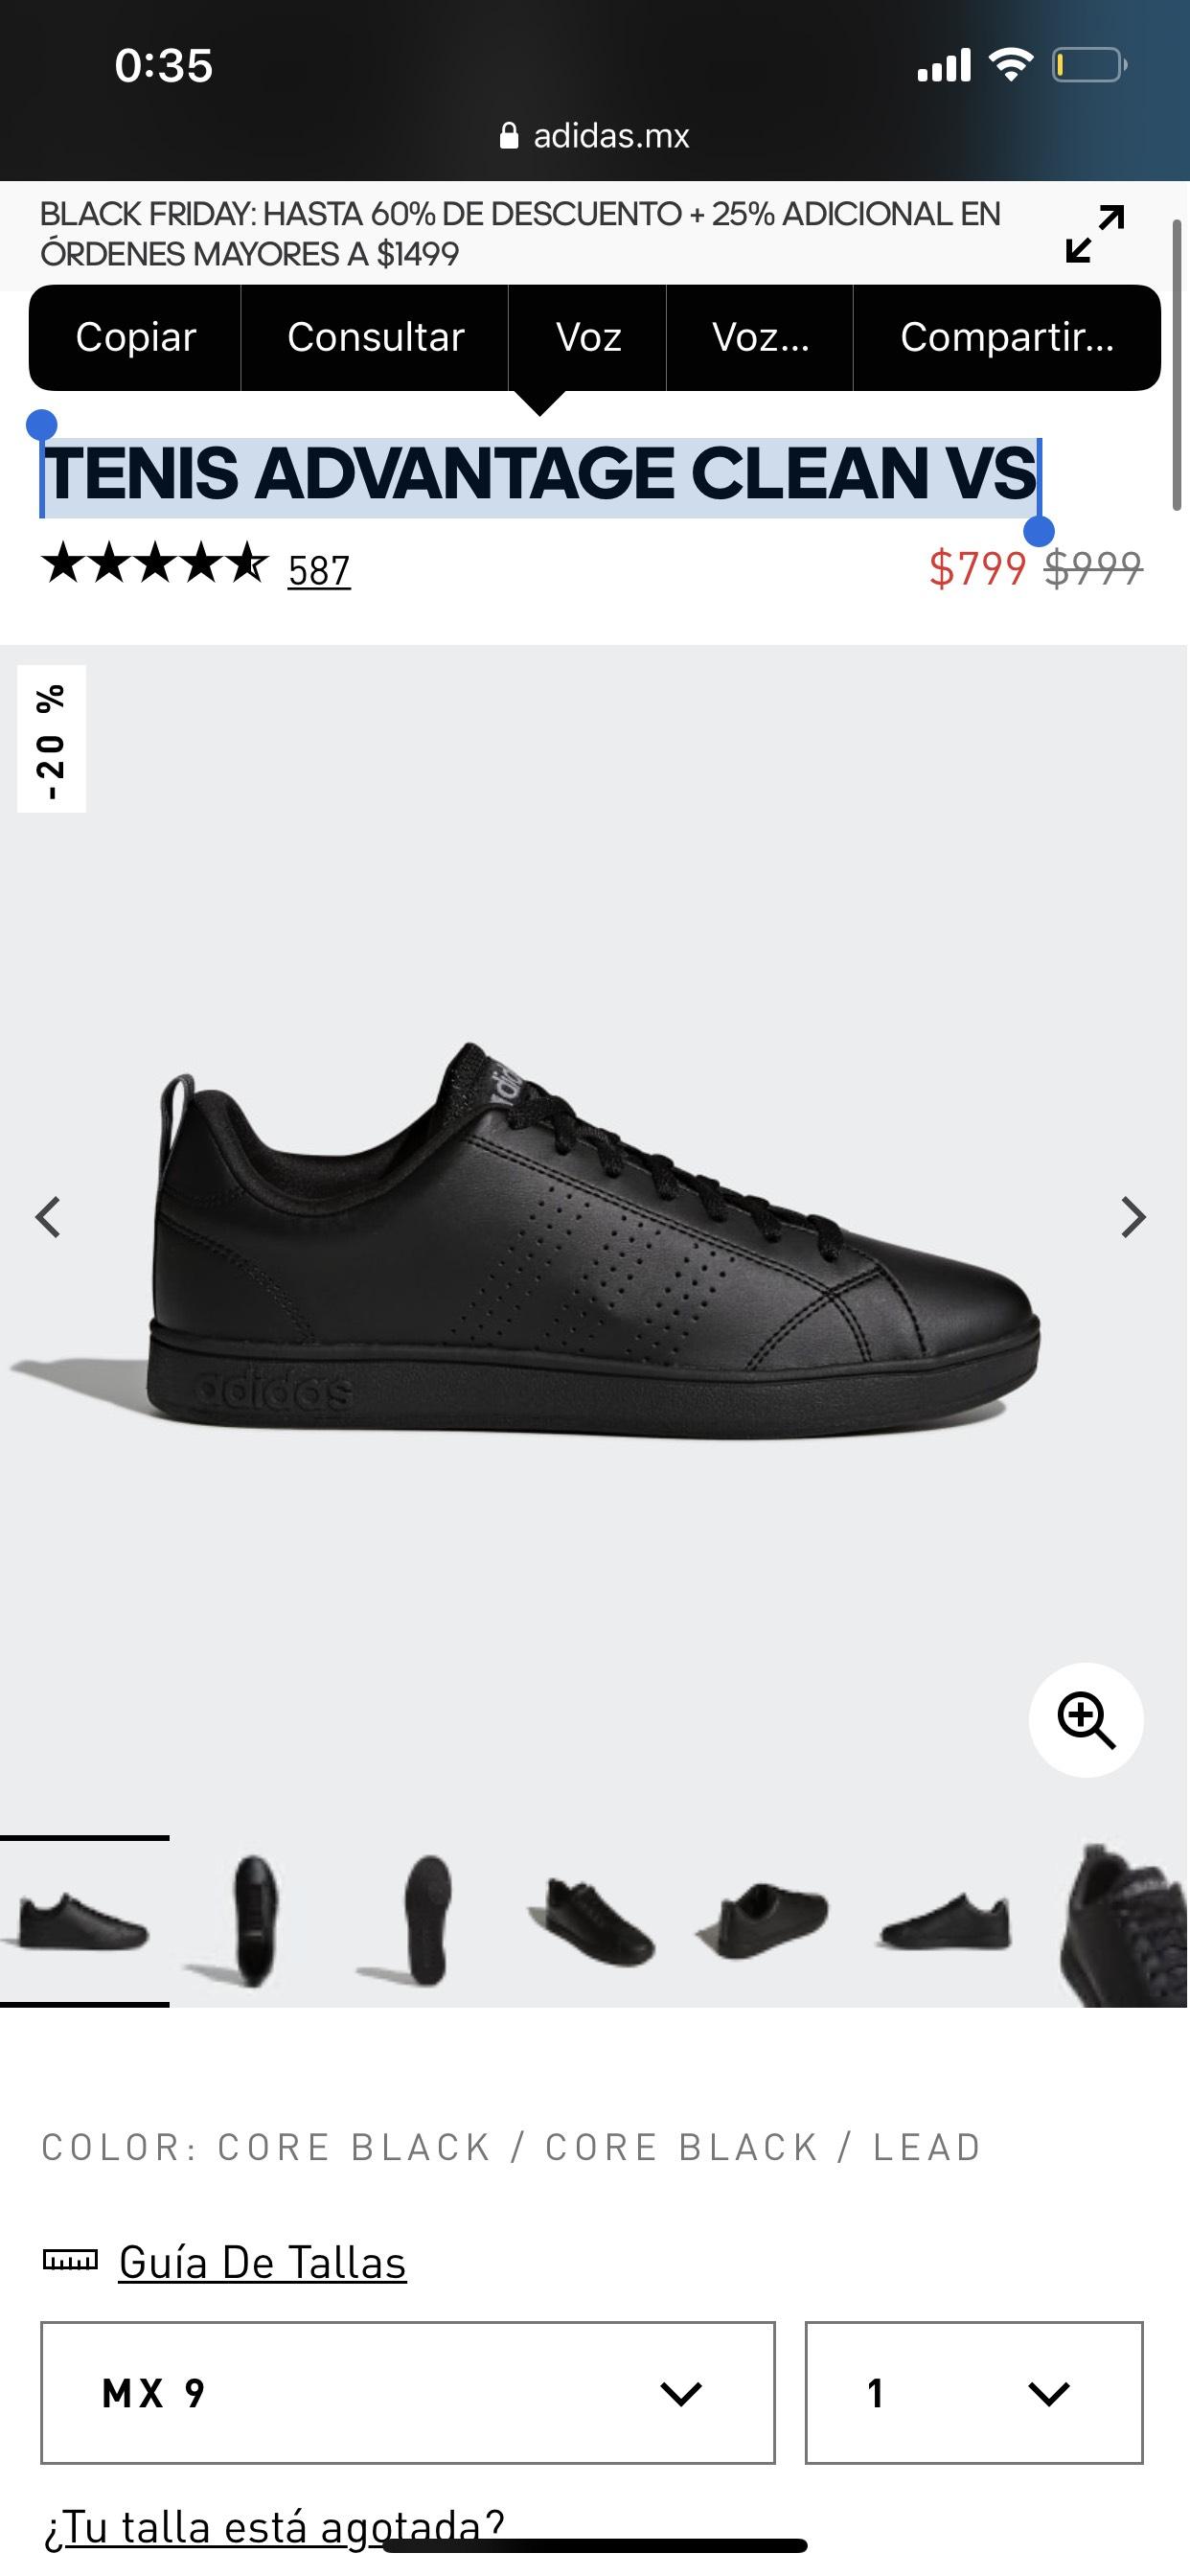 Adidas: TENIS ADVANTAGE CLEAN VS